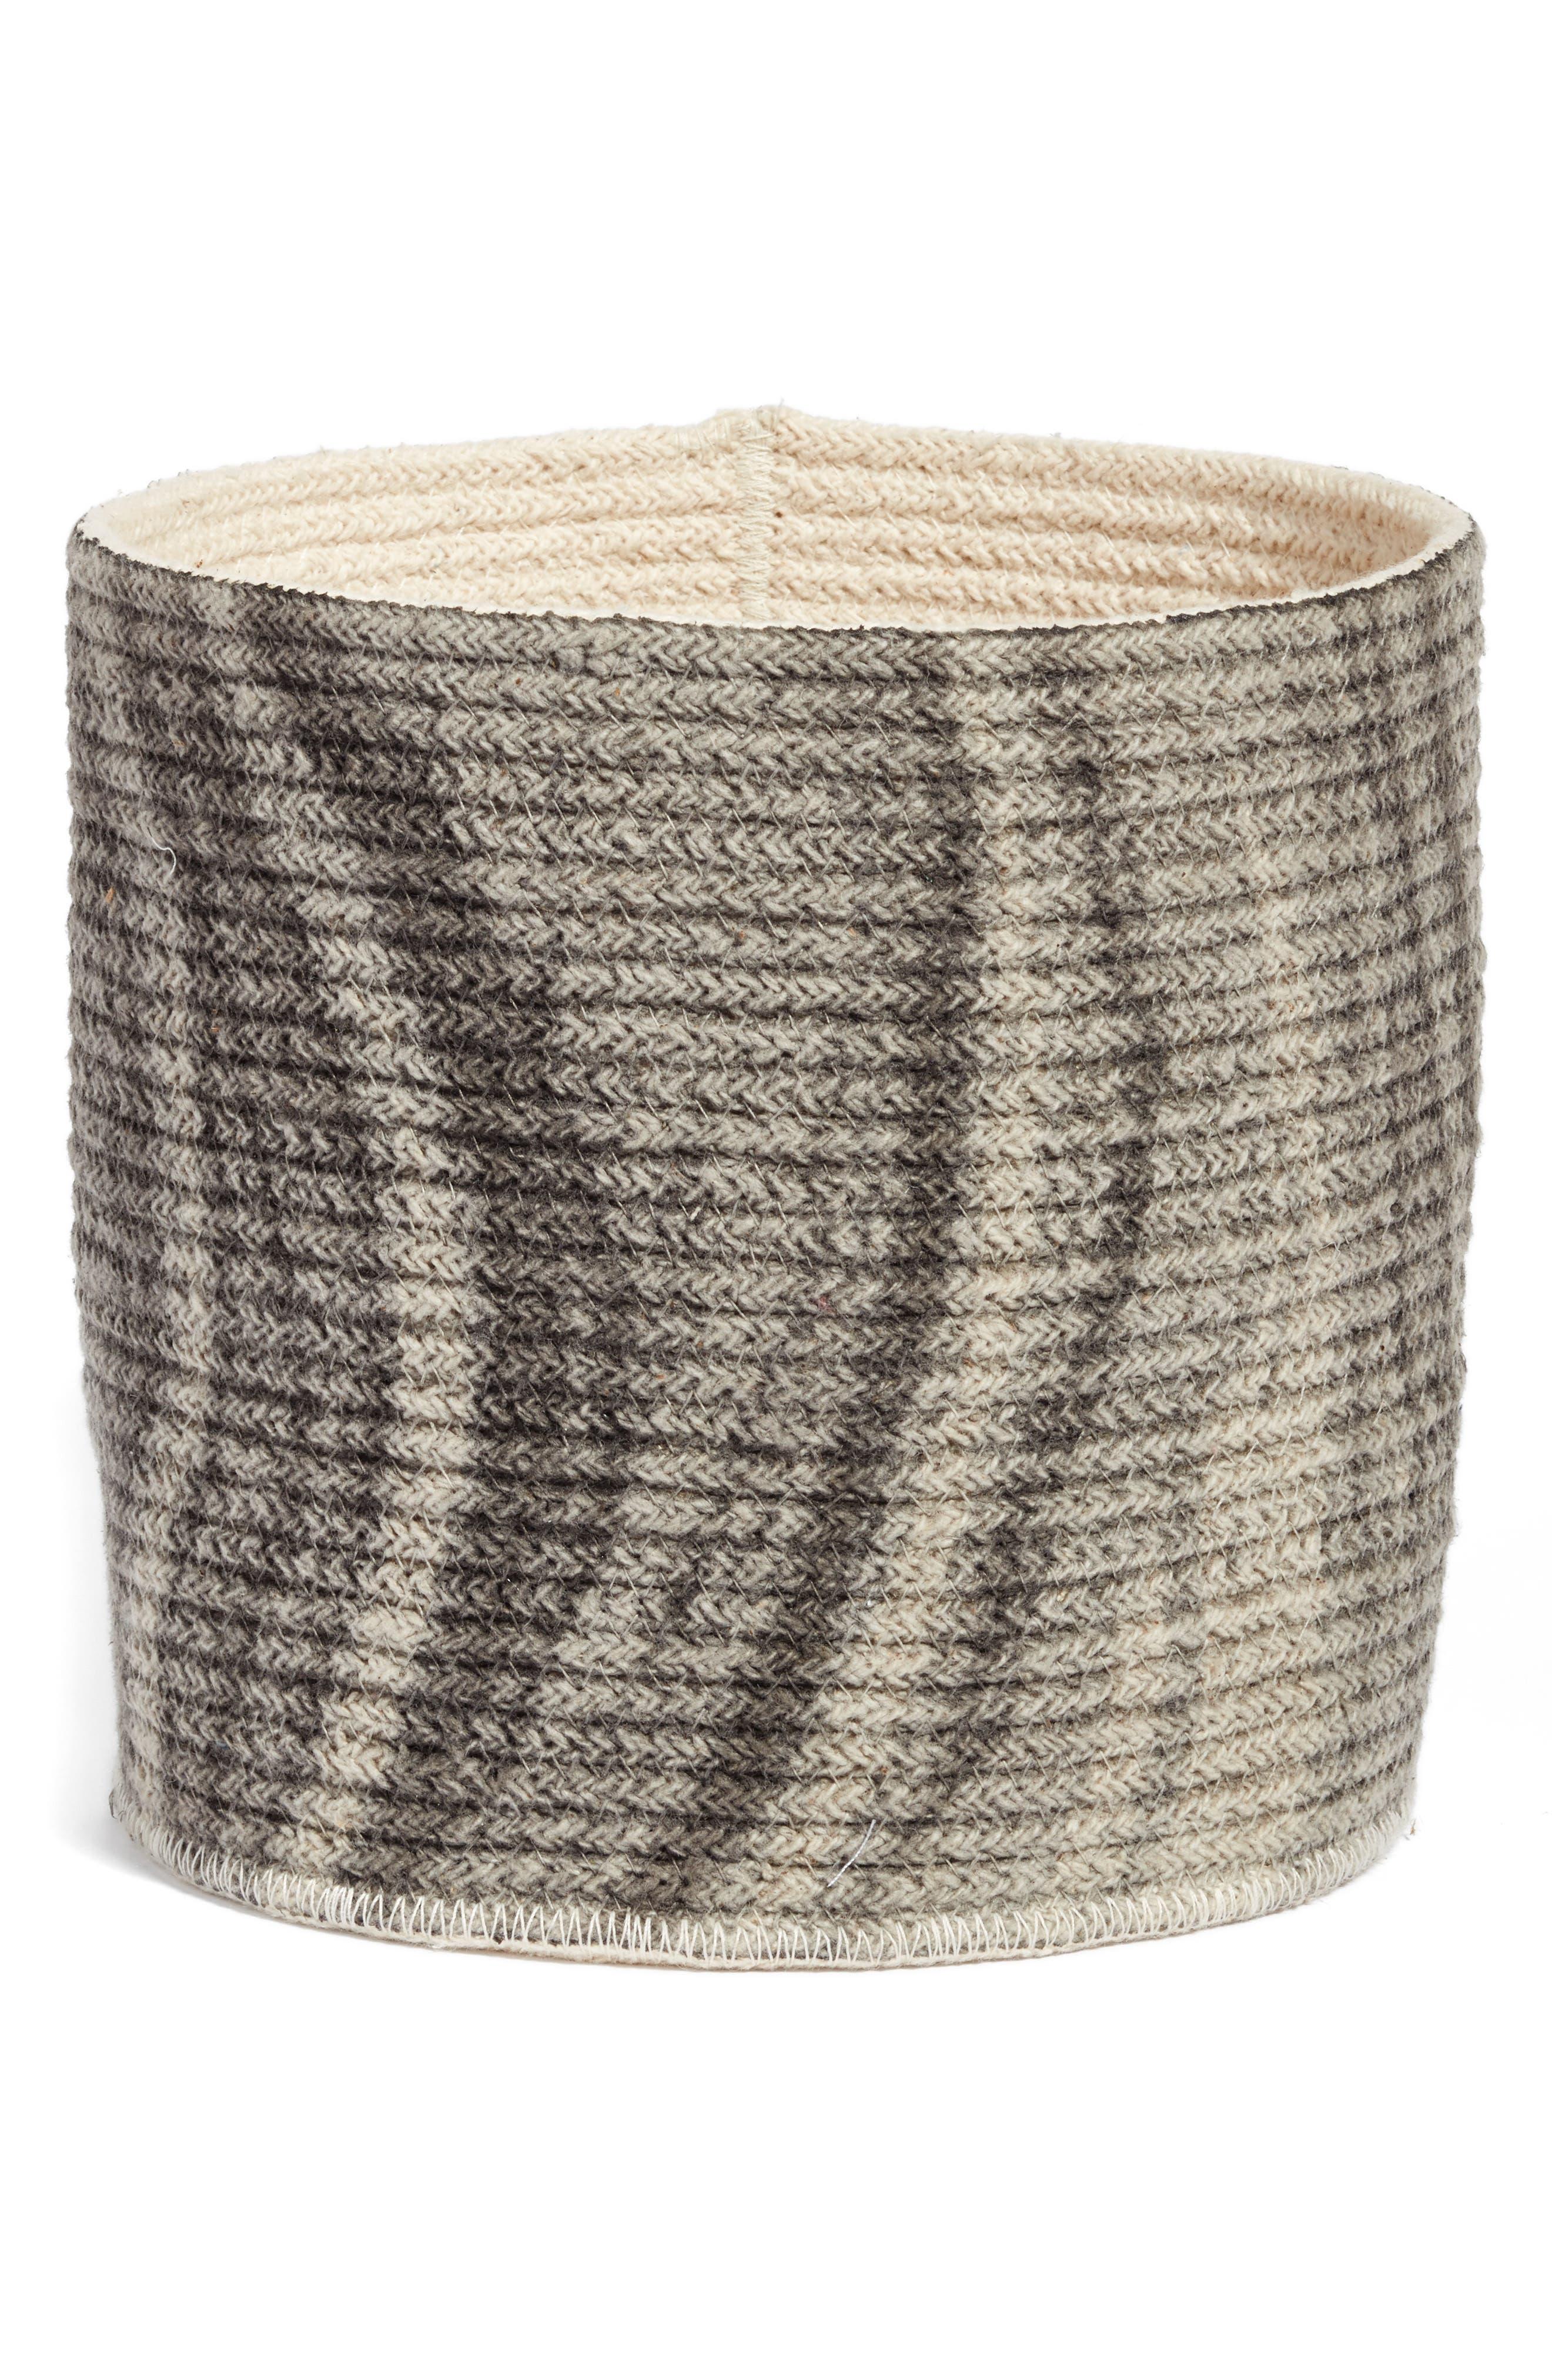 Oceana Woven Basket,                         Main,                         color,